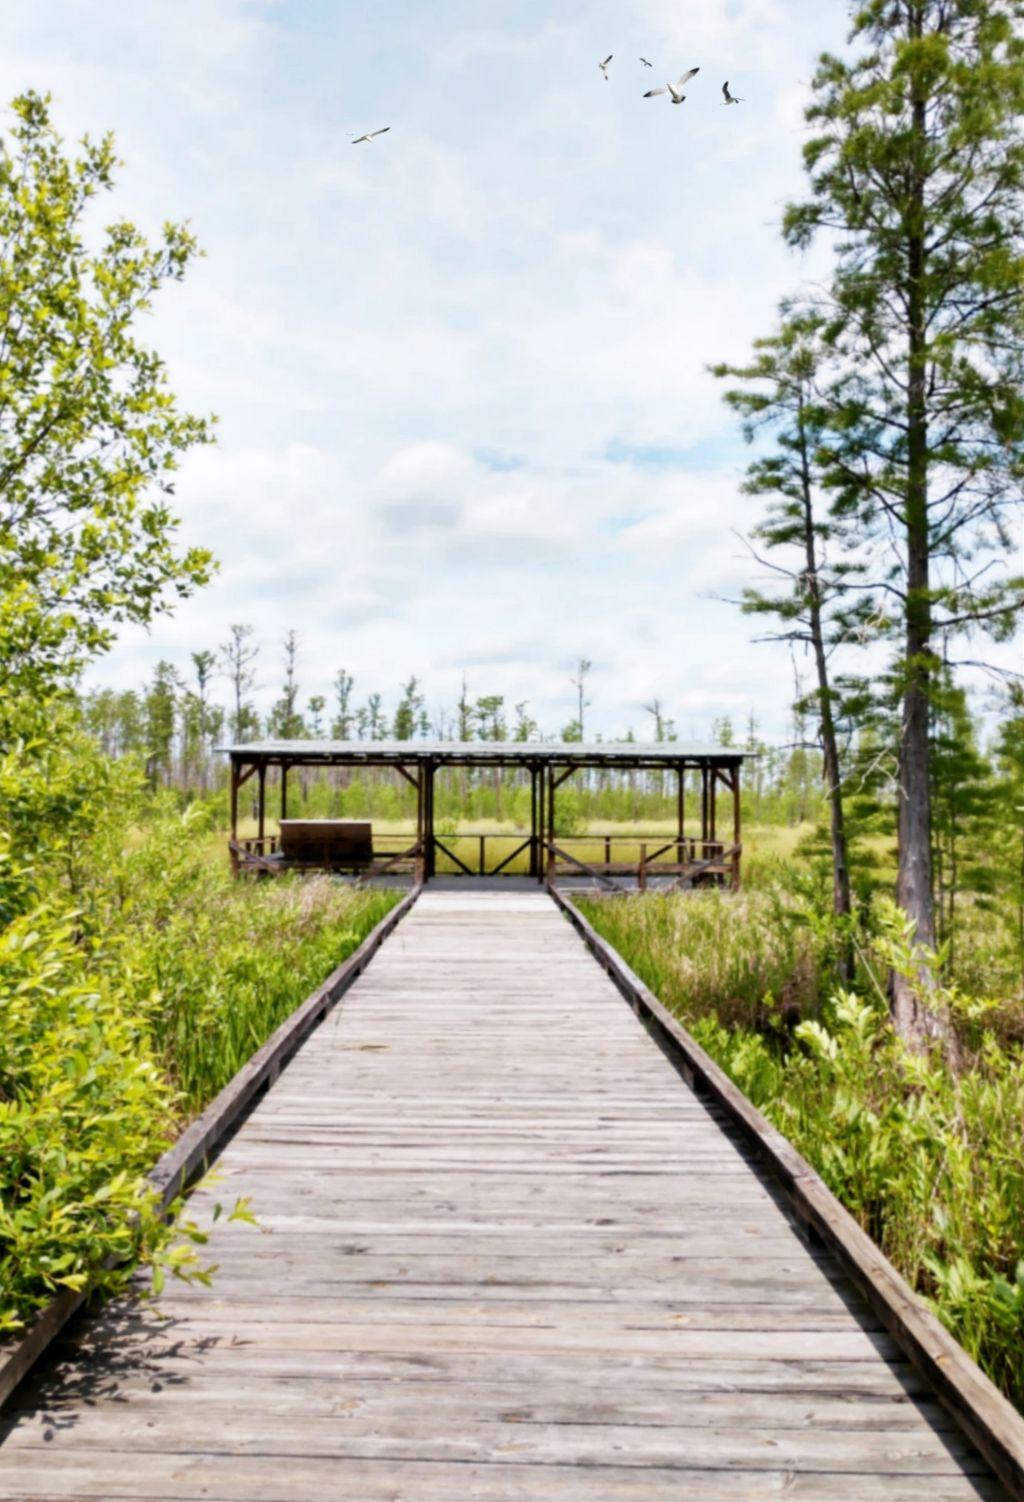 Okefenokee Swamp adventure - #freetoedit #okefenokee #okefenokeeswamp #observation #swamp #outdoors #nature #naturelover #happiness #birds #observationdeck #trees #green #view #wildlife #remixit